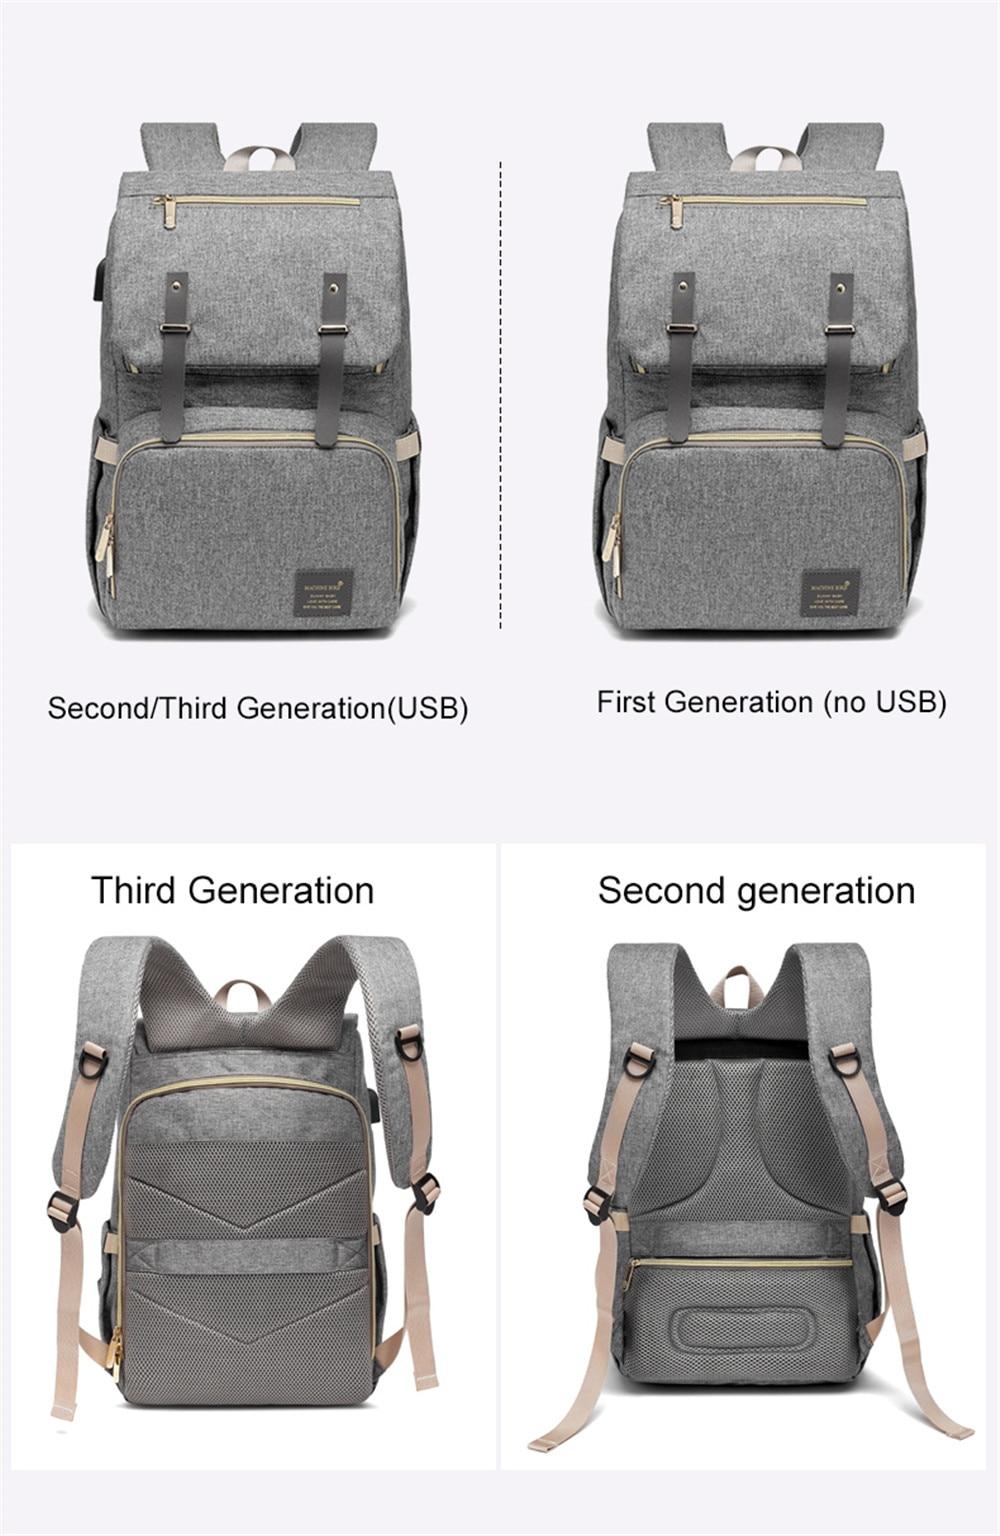 HTB1lqIqMYvpK1RjSZPiq6zmwXXaK Fashion Large Capacity Baby Nappy Bag Diaper Bag Purse Multifunction USB Mummy Travel Backpack Women Nursing Bags For Mom Daddy